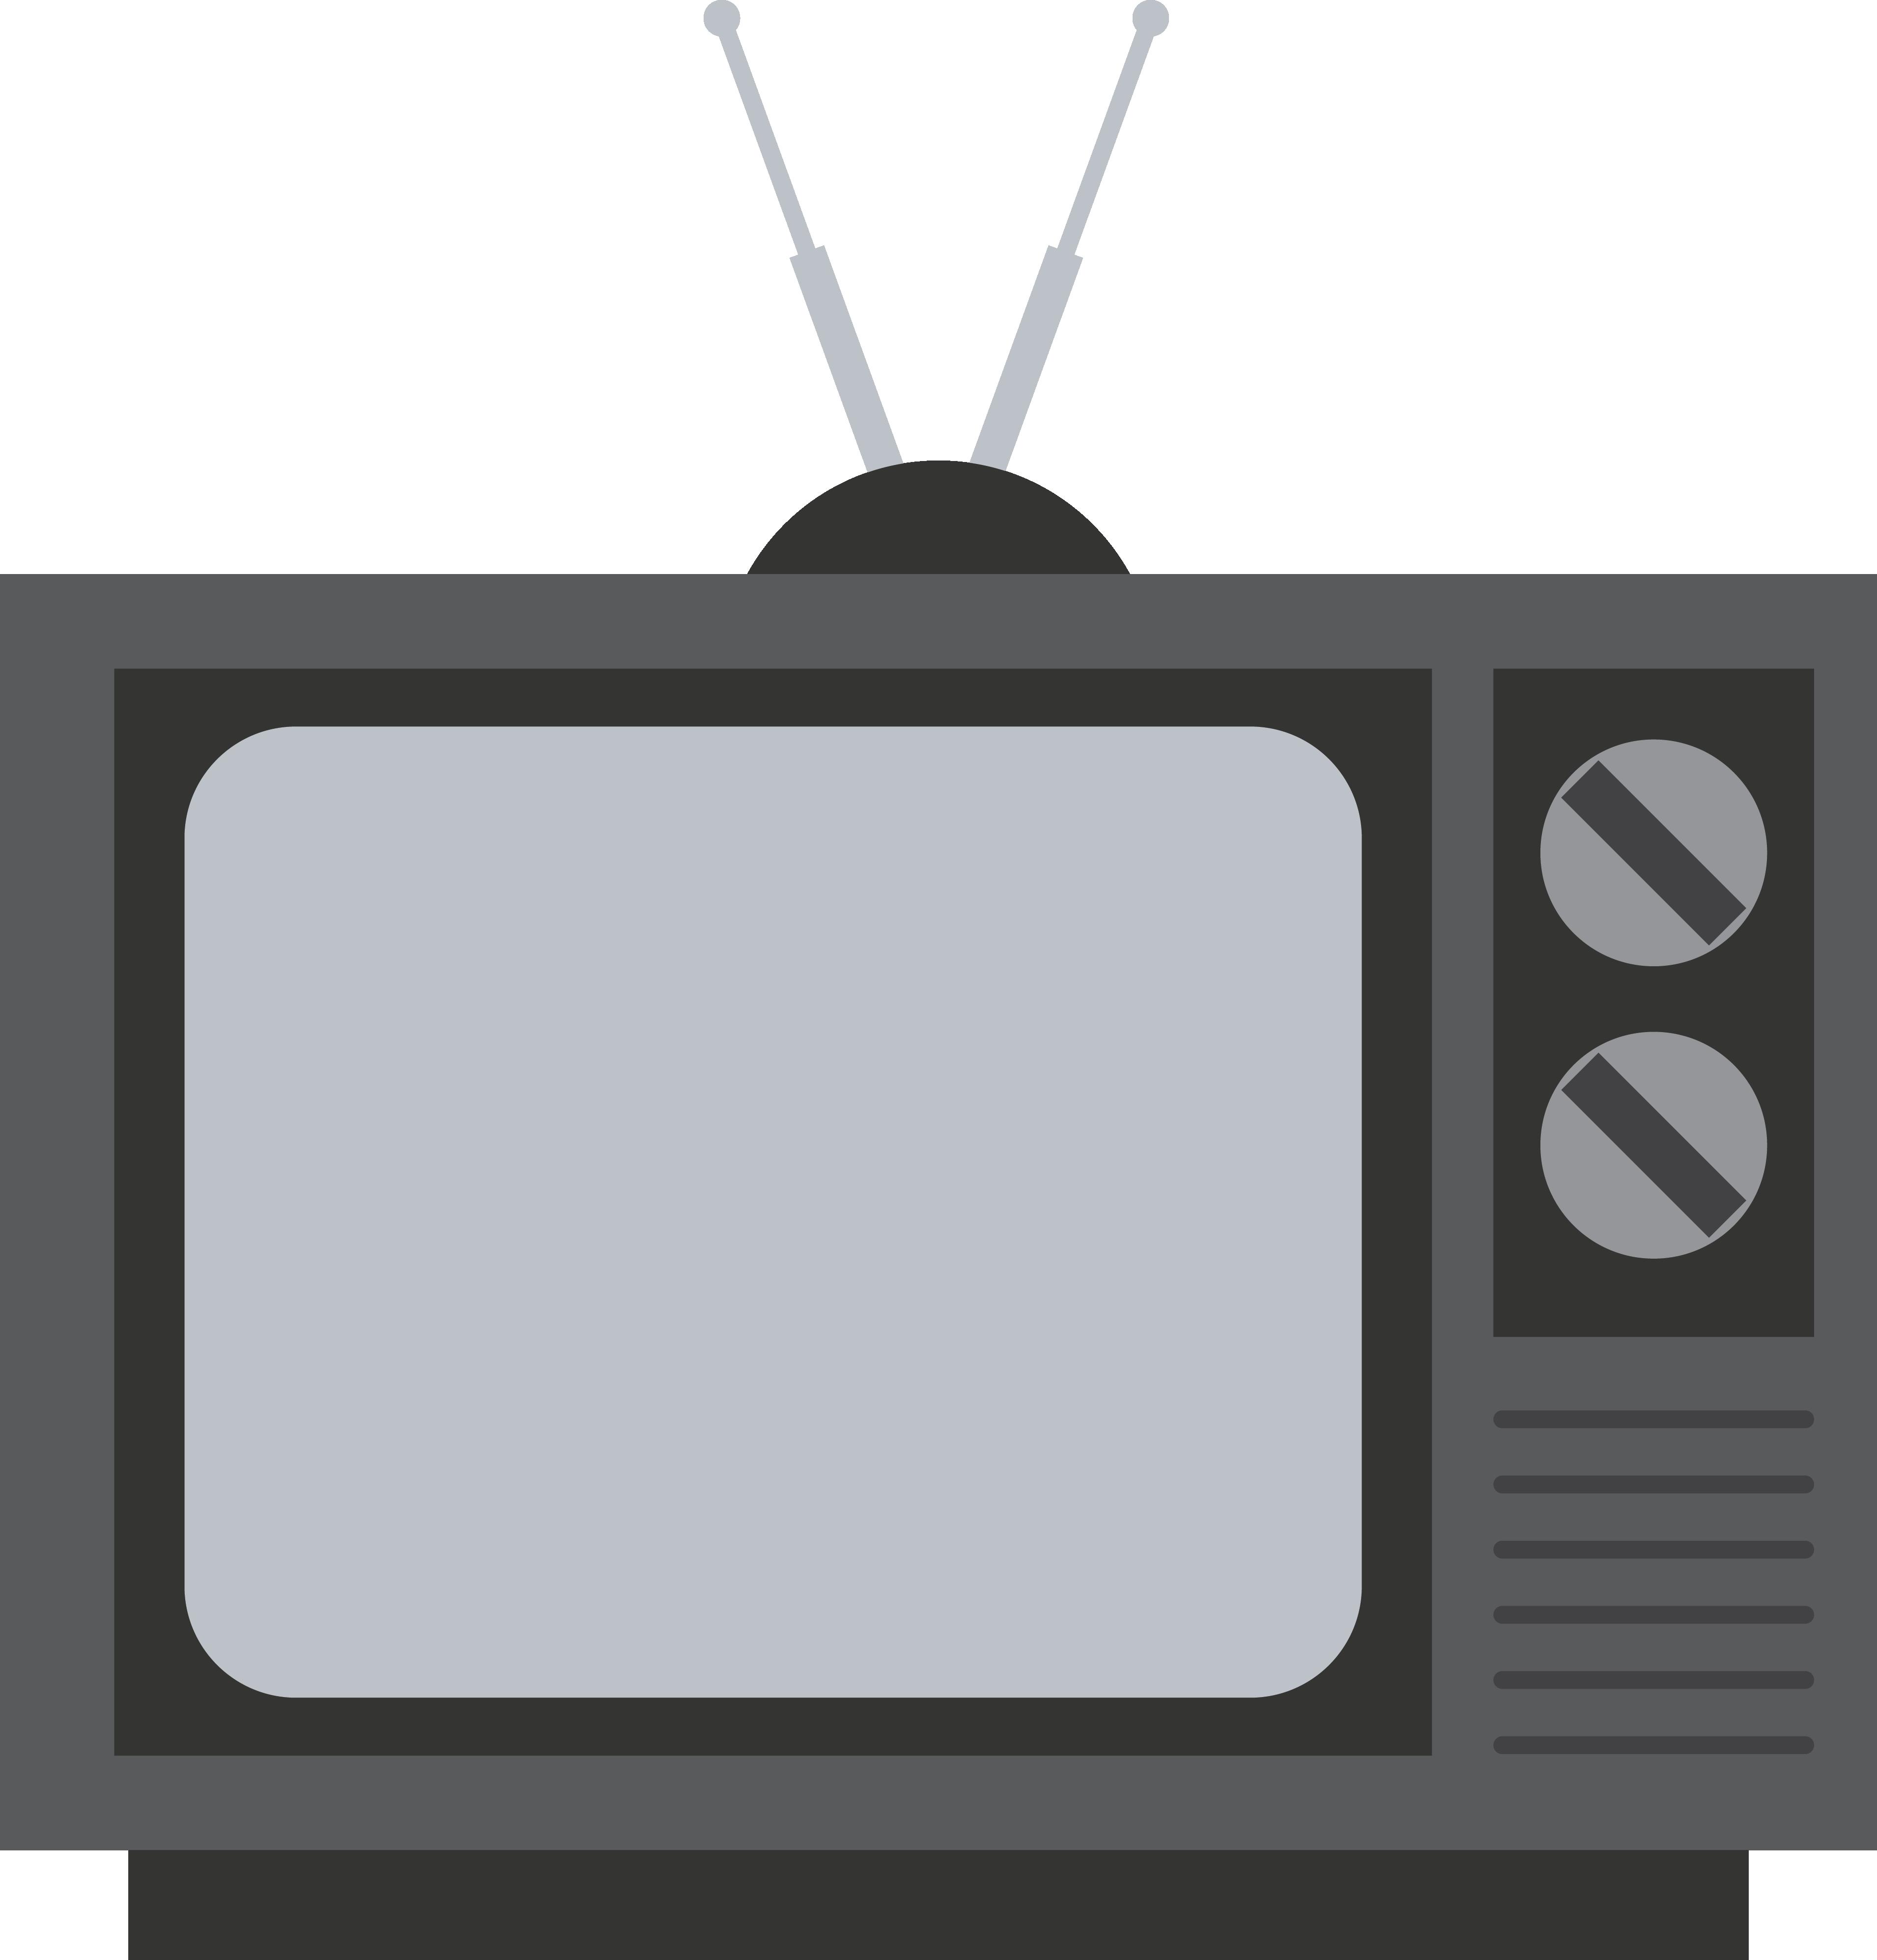 Television show freetoair.